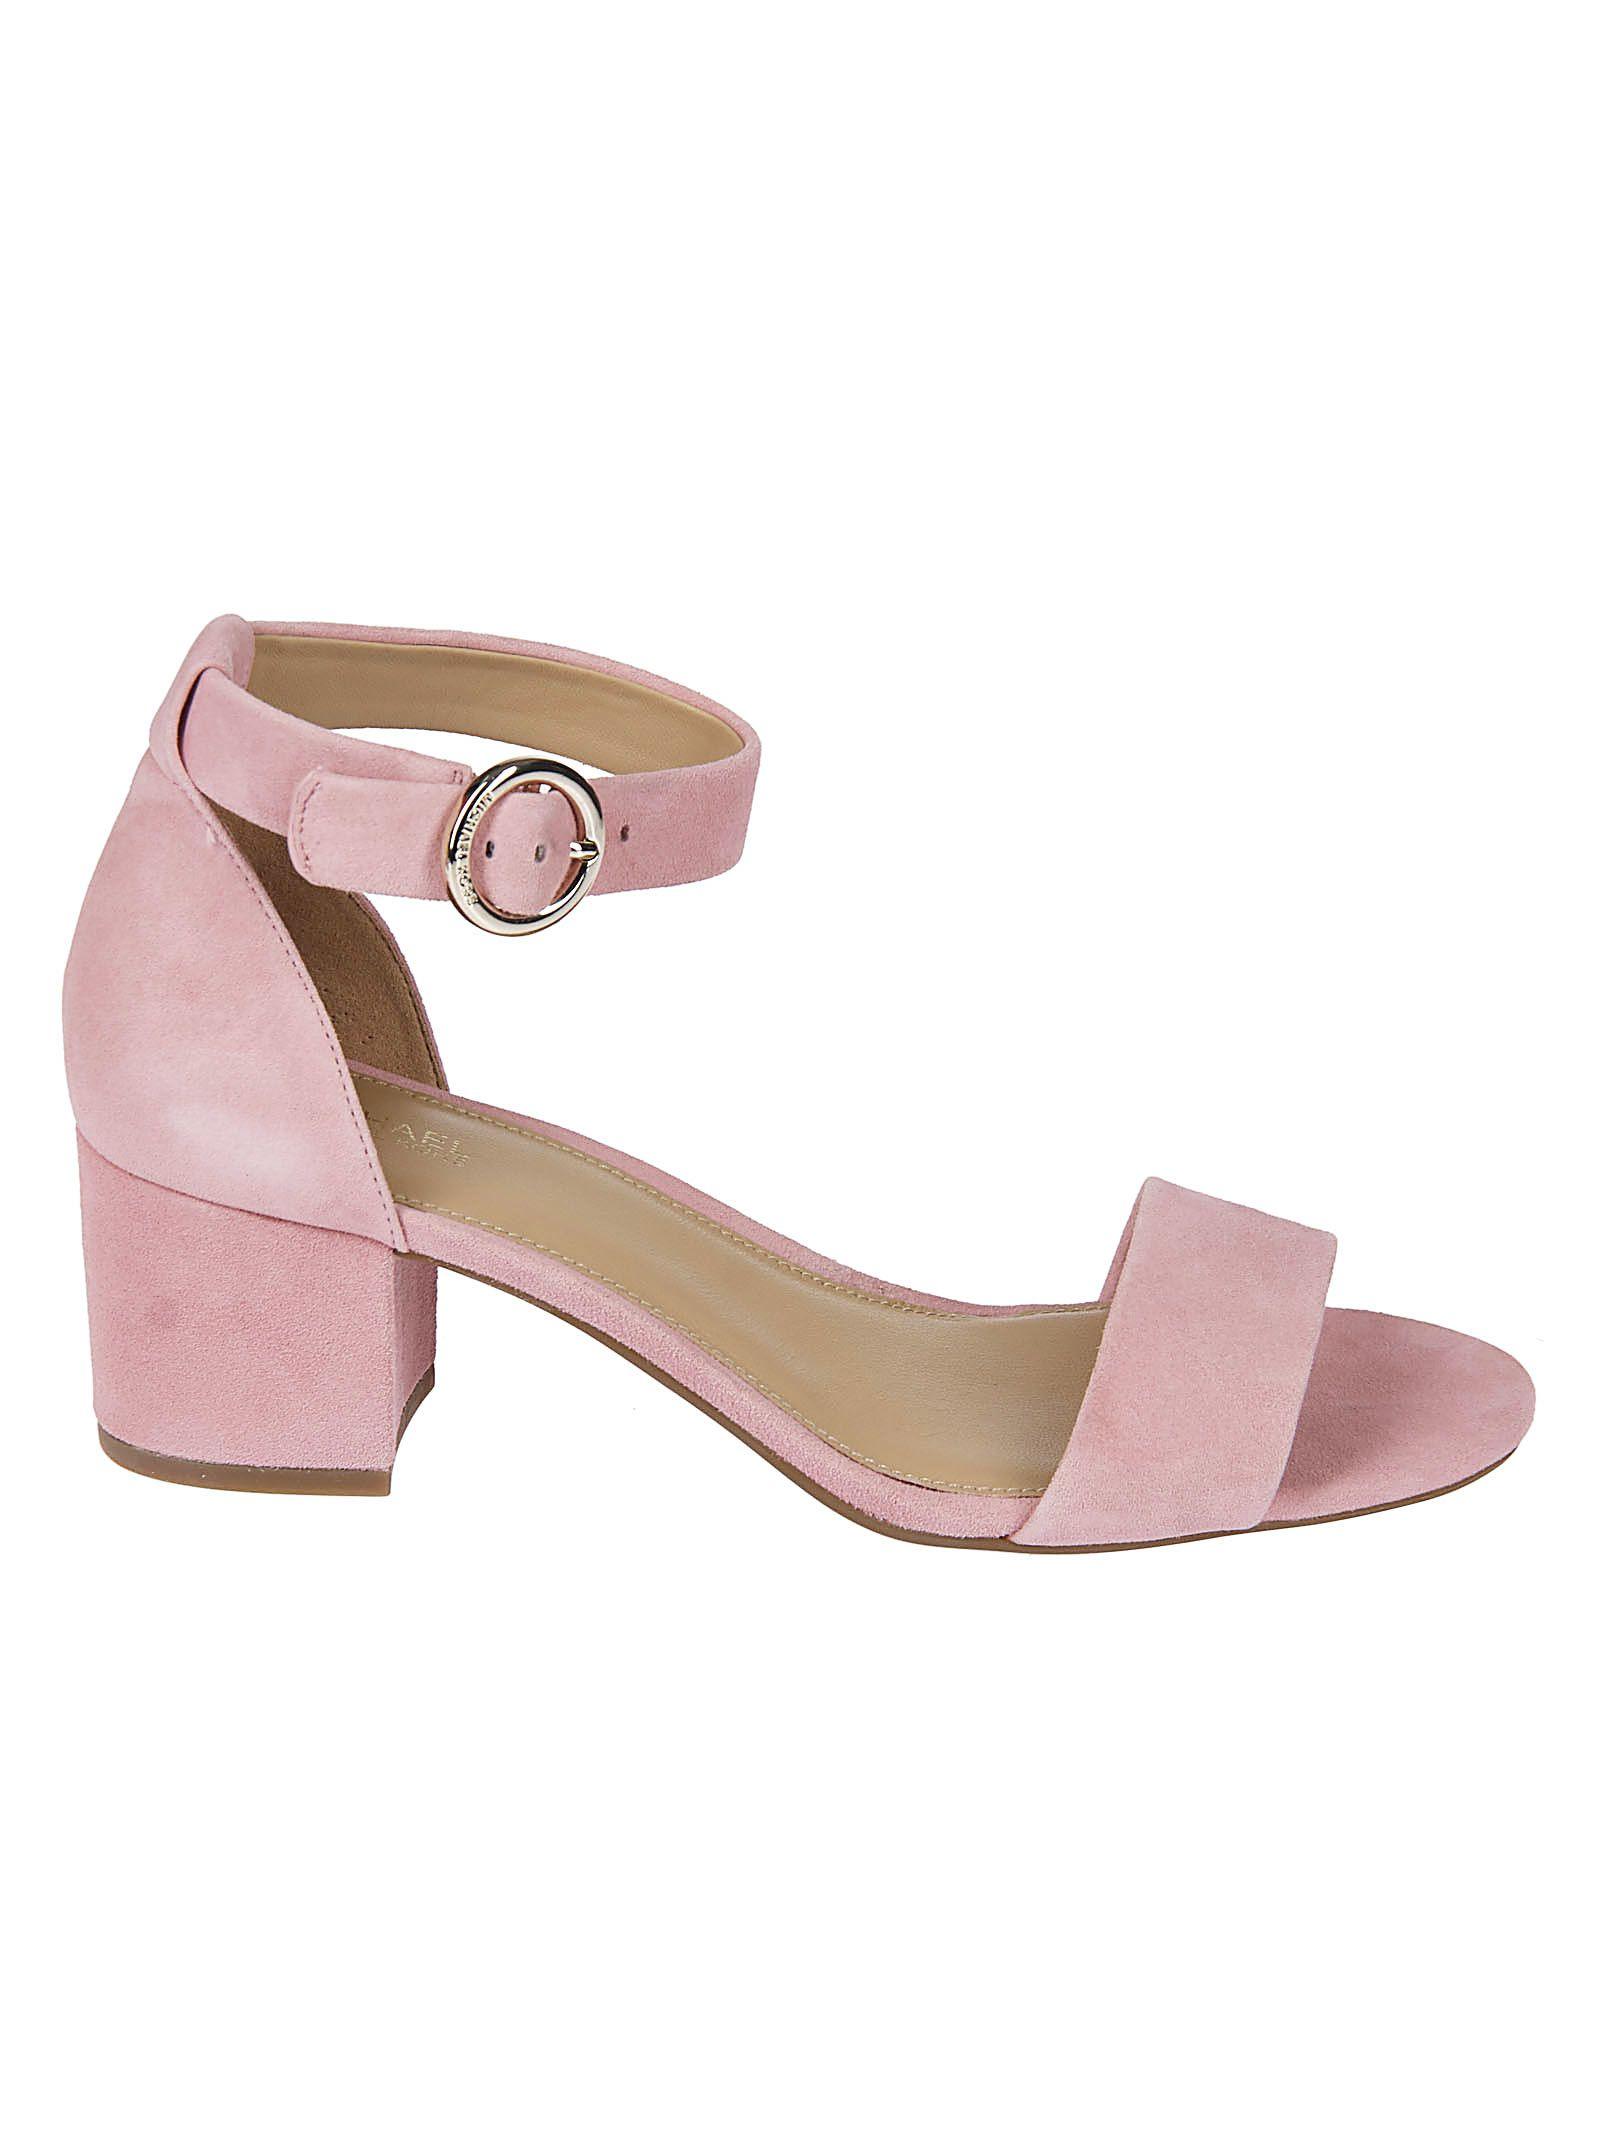 02beaaaea30 Michael Kors Michael Kors Lena Mid-heel Sandals - Pink - 10829618 ...